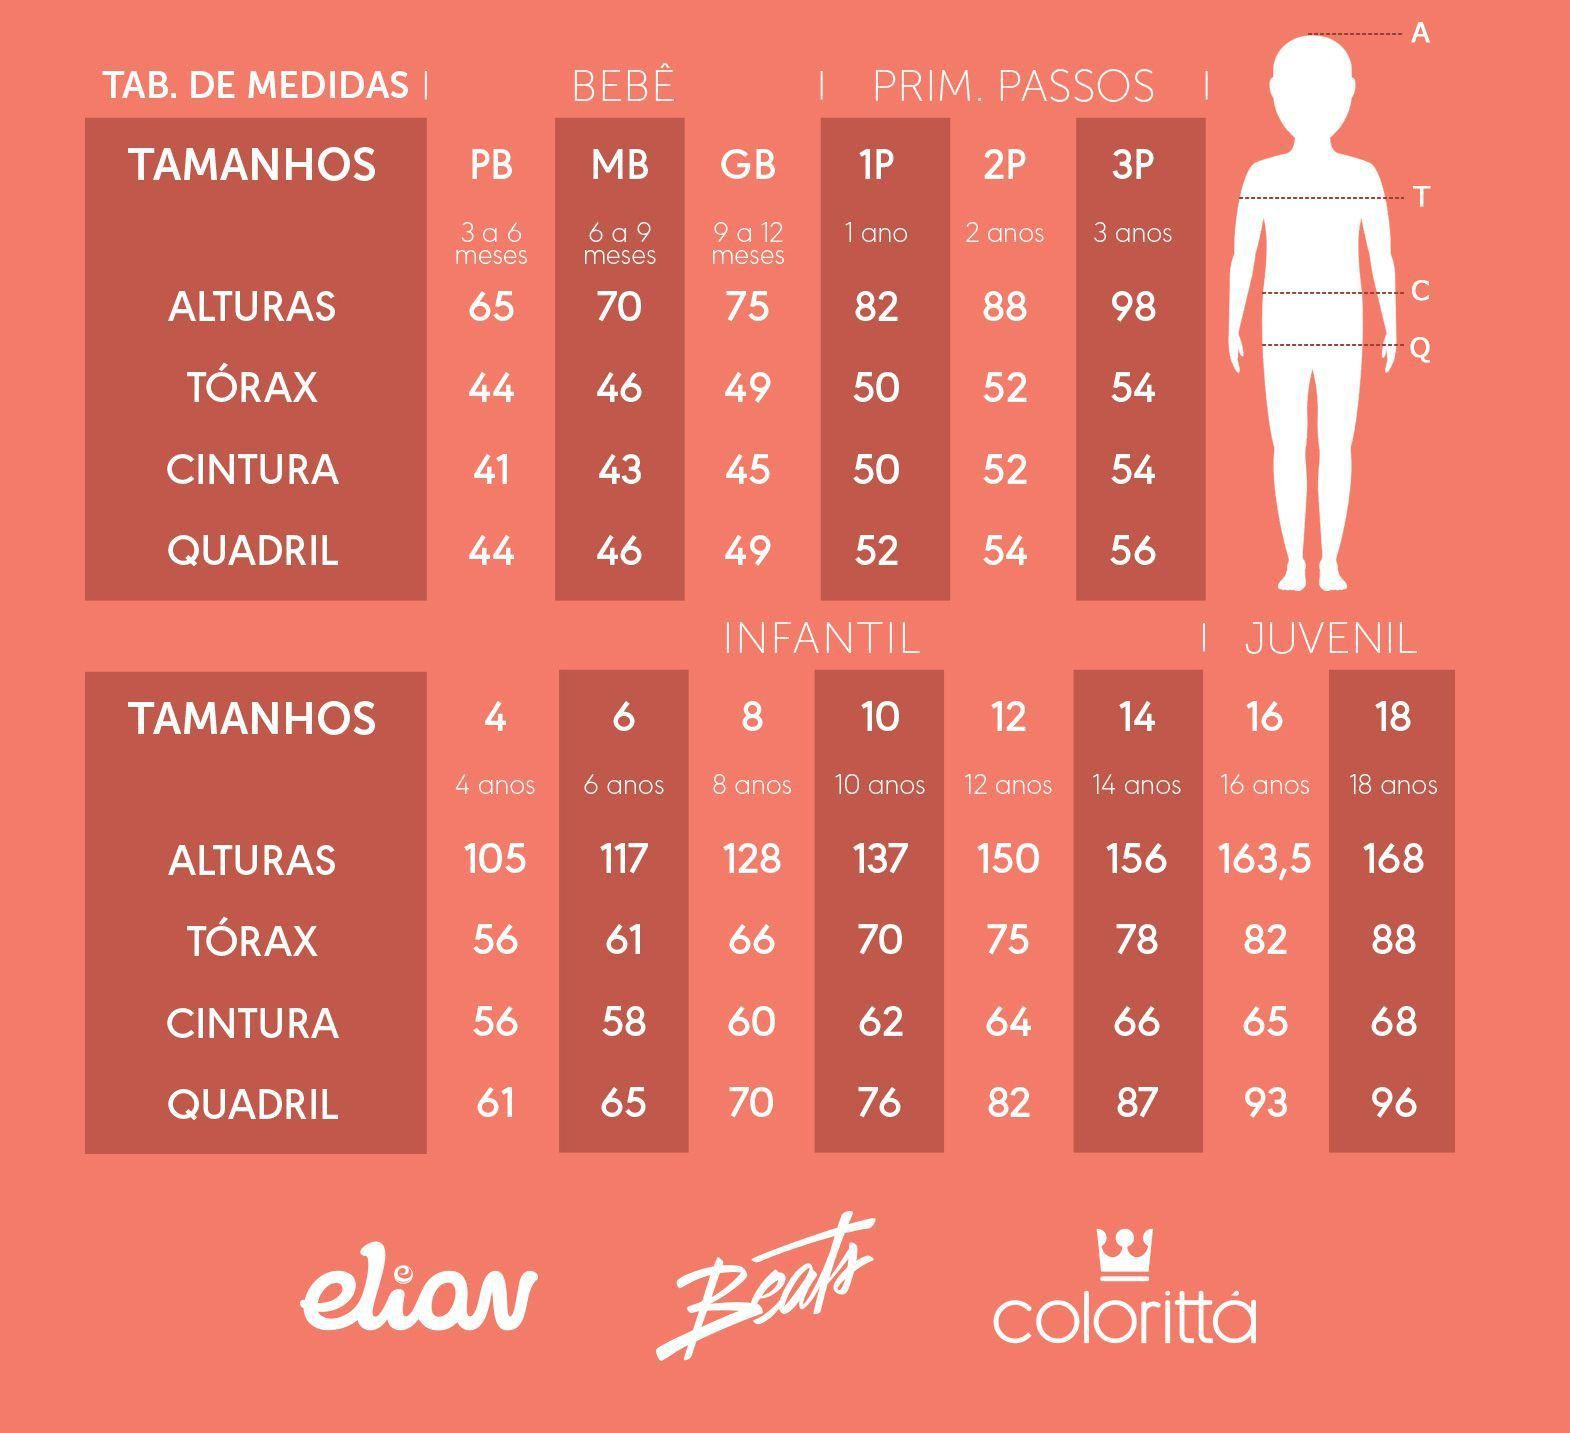 Legging Flanelada Infantil Feminina Inverno Marinho Elian: Tabela de medidas